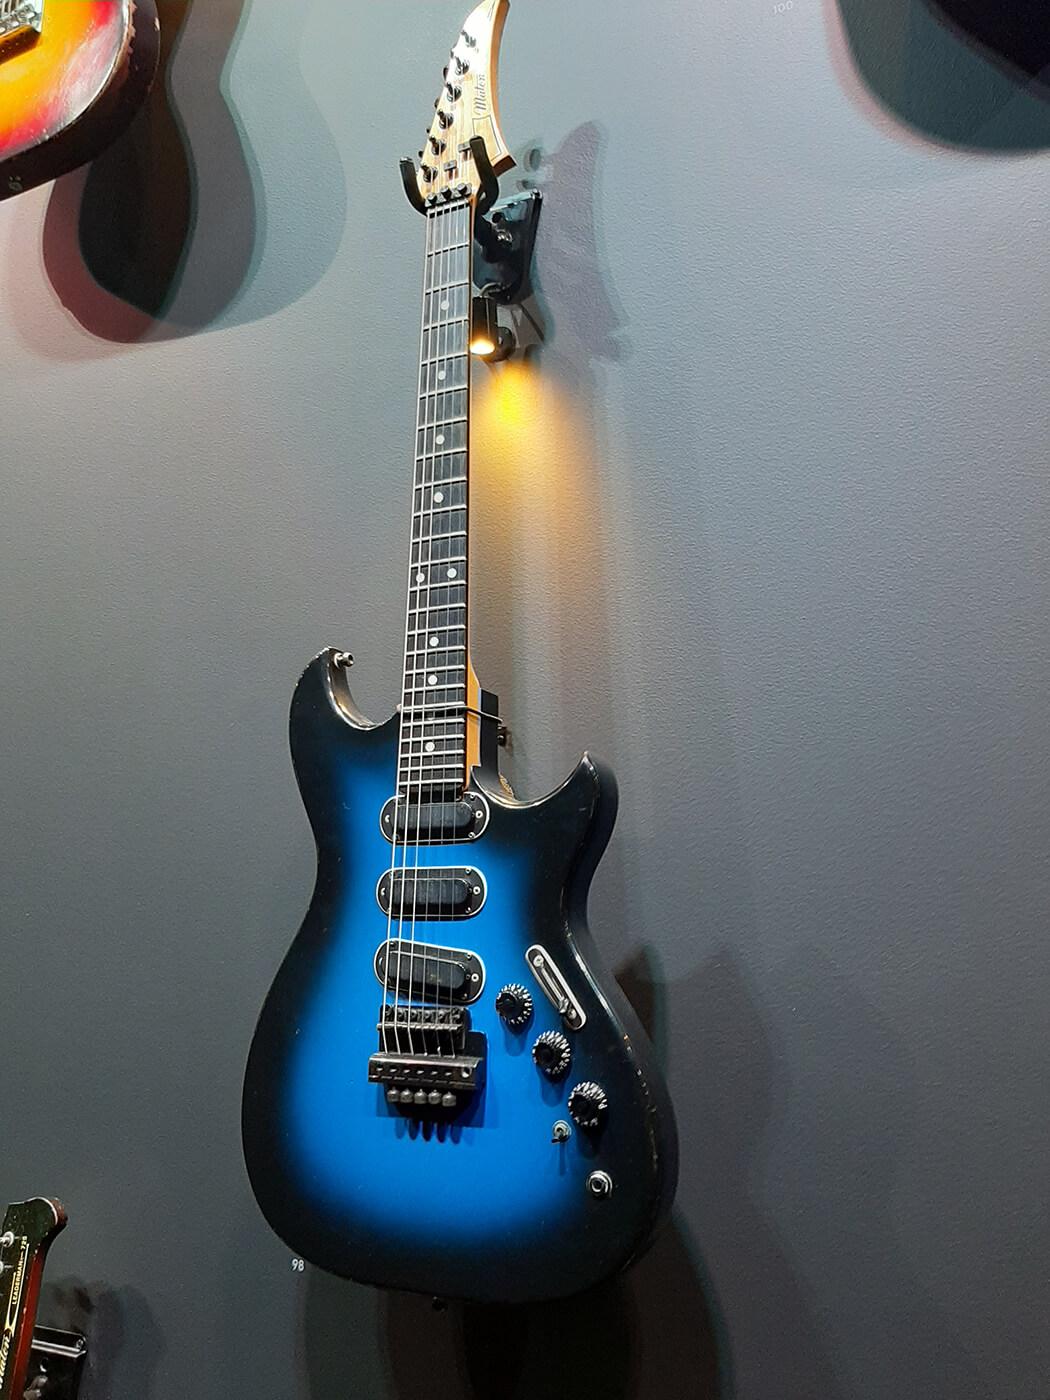 1985 Electric SC500 Scorpion